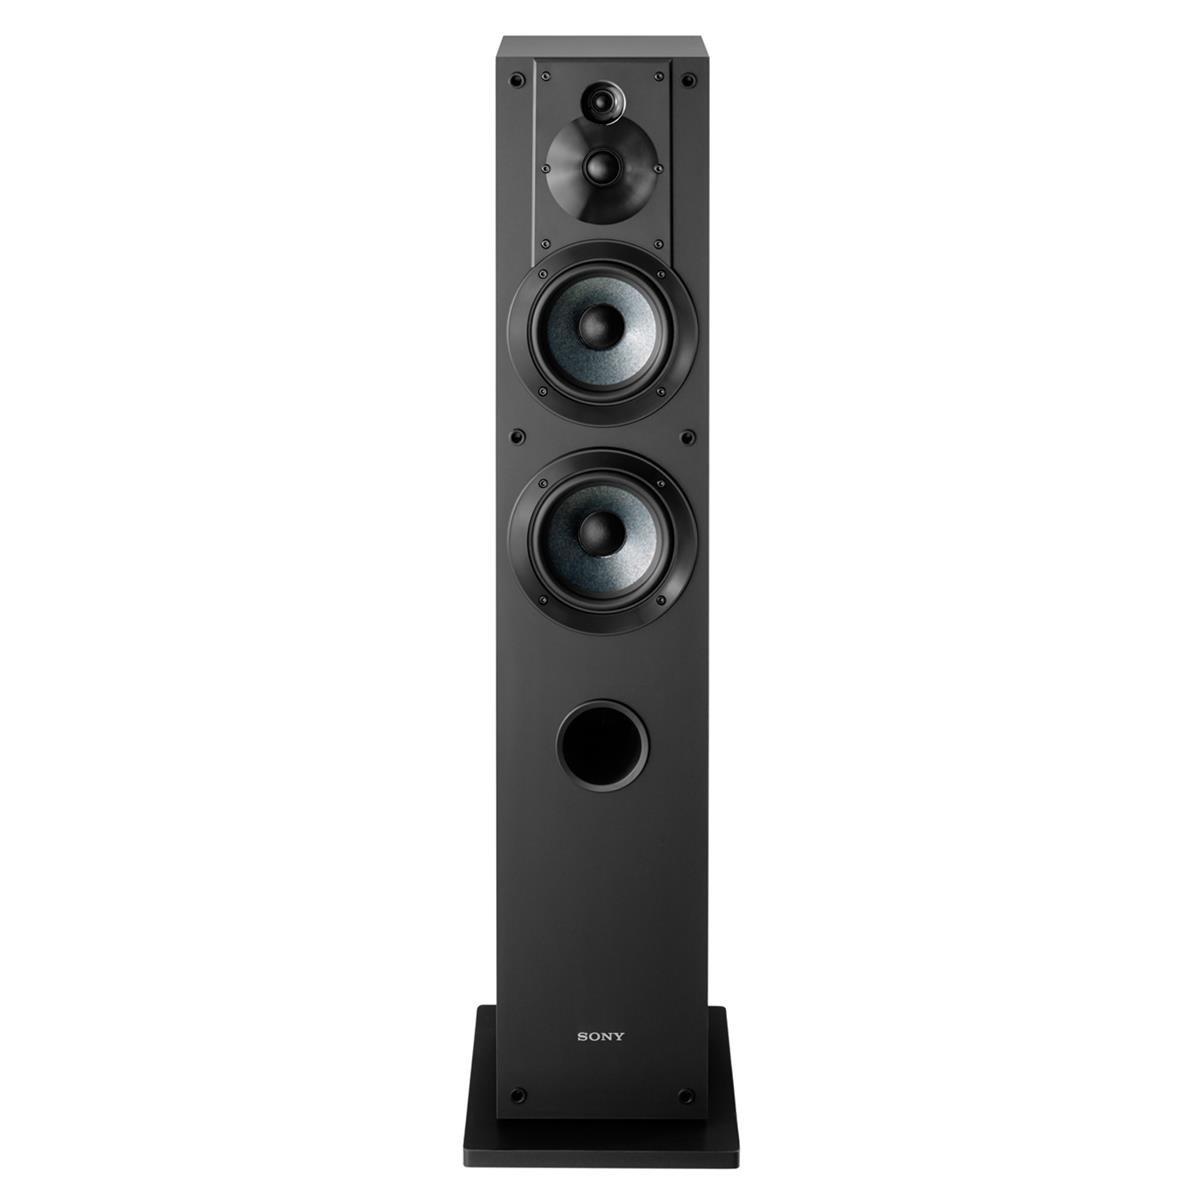 Sony SS-CS3 3-Way 4-Driver Floor-Standing Speaker - Pair (Black) by Sony (Image #4)